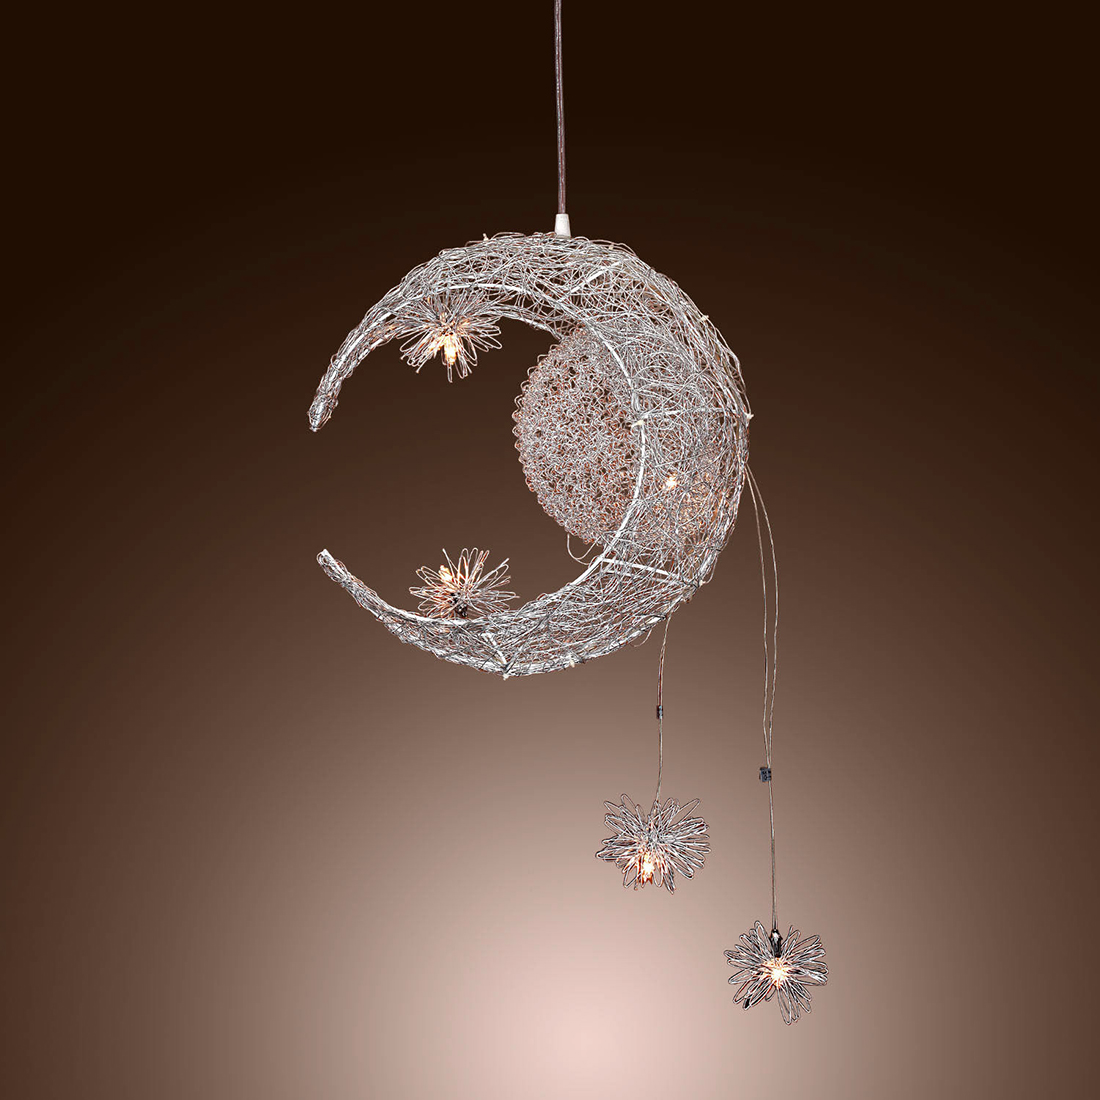 Moon & Star Sweet Bedroom Lighting Pendant Lamp Chandelier Ceiling Light Fixture брошь moon paris moon paris mo038dwynx31